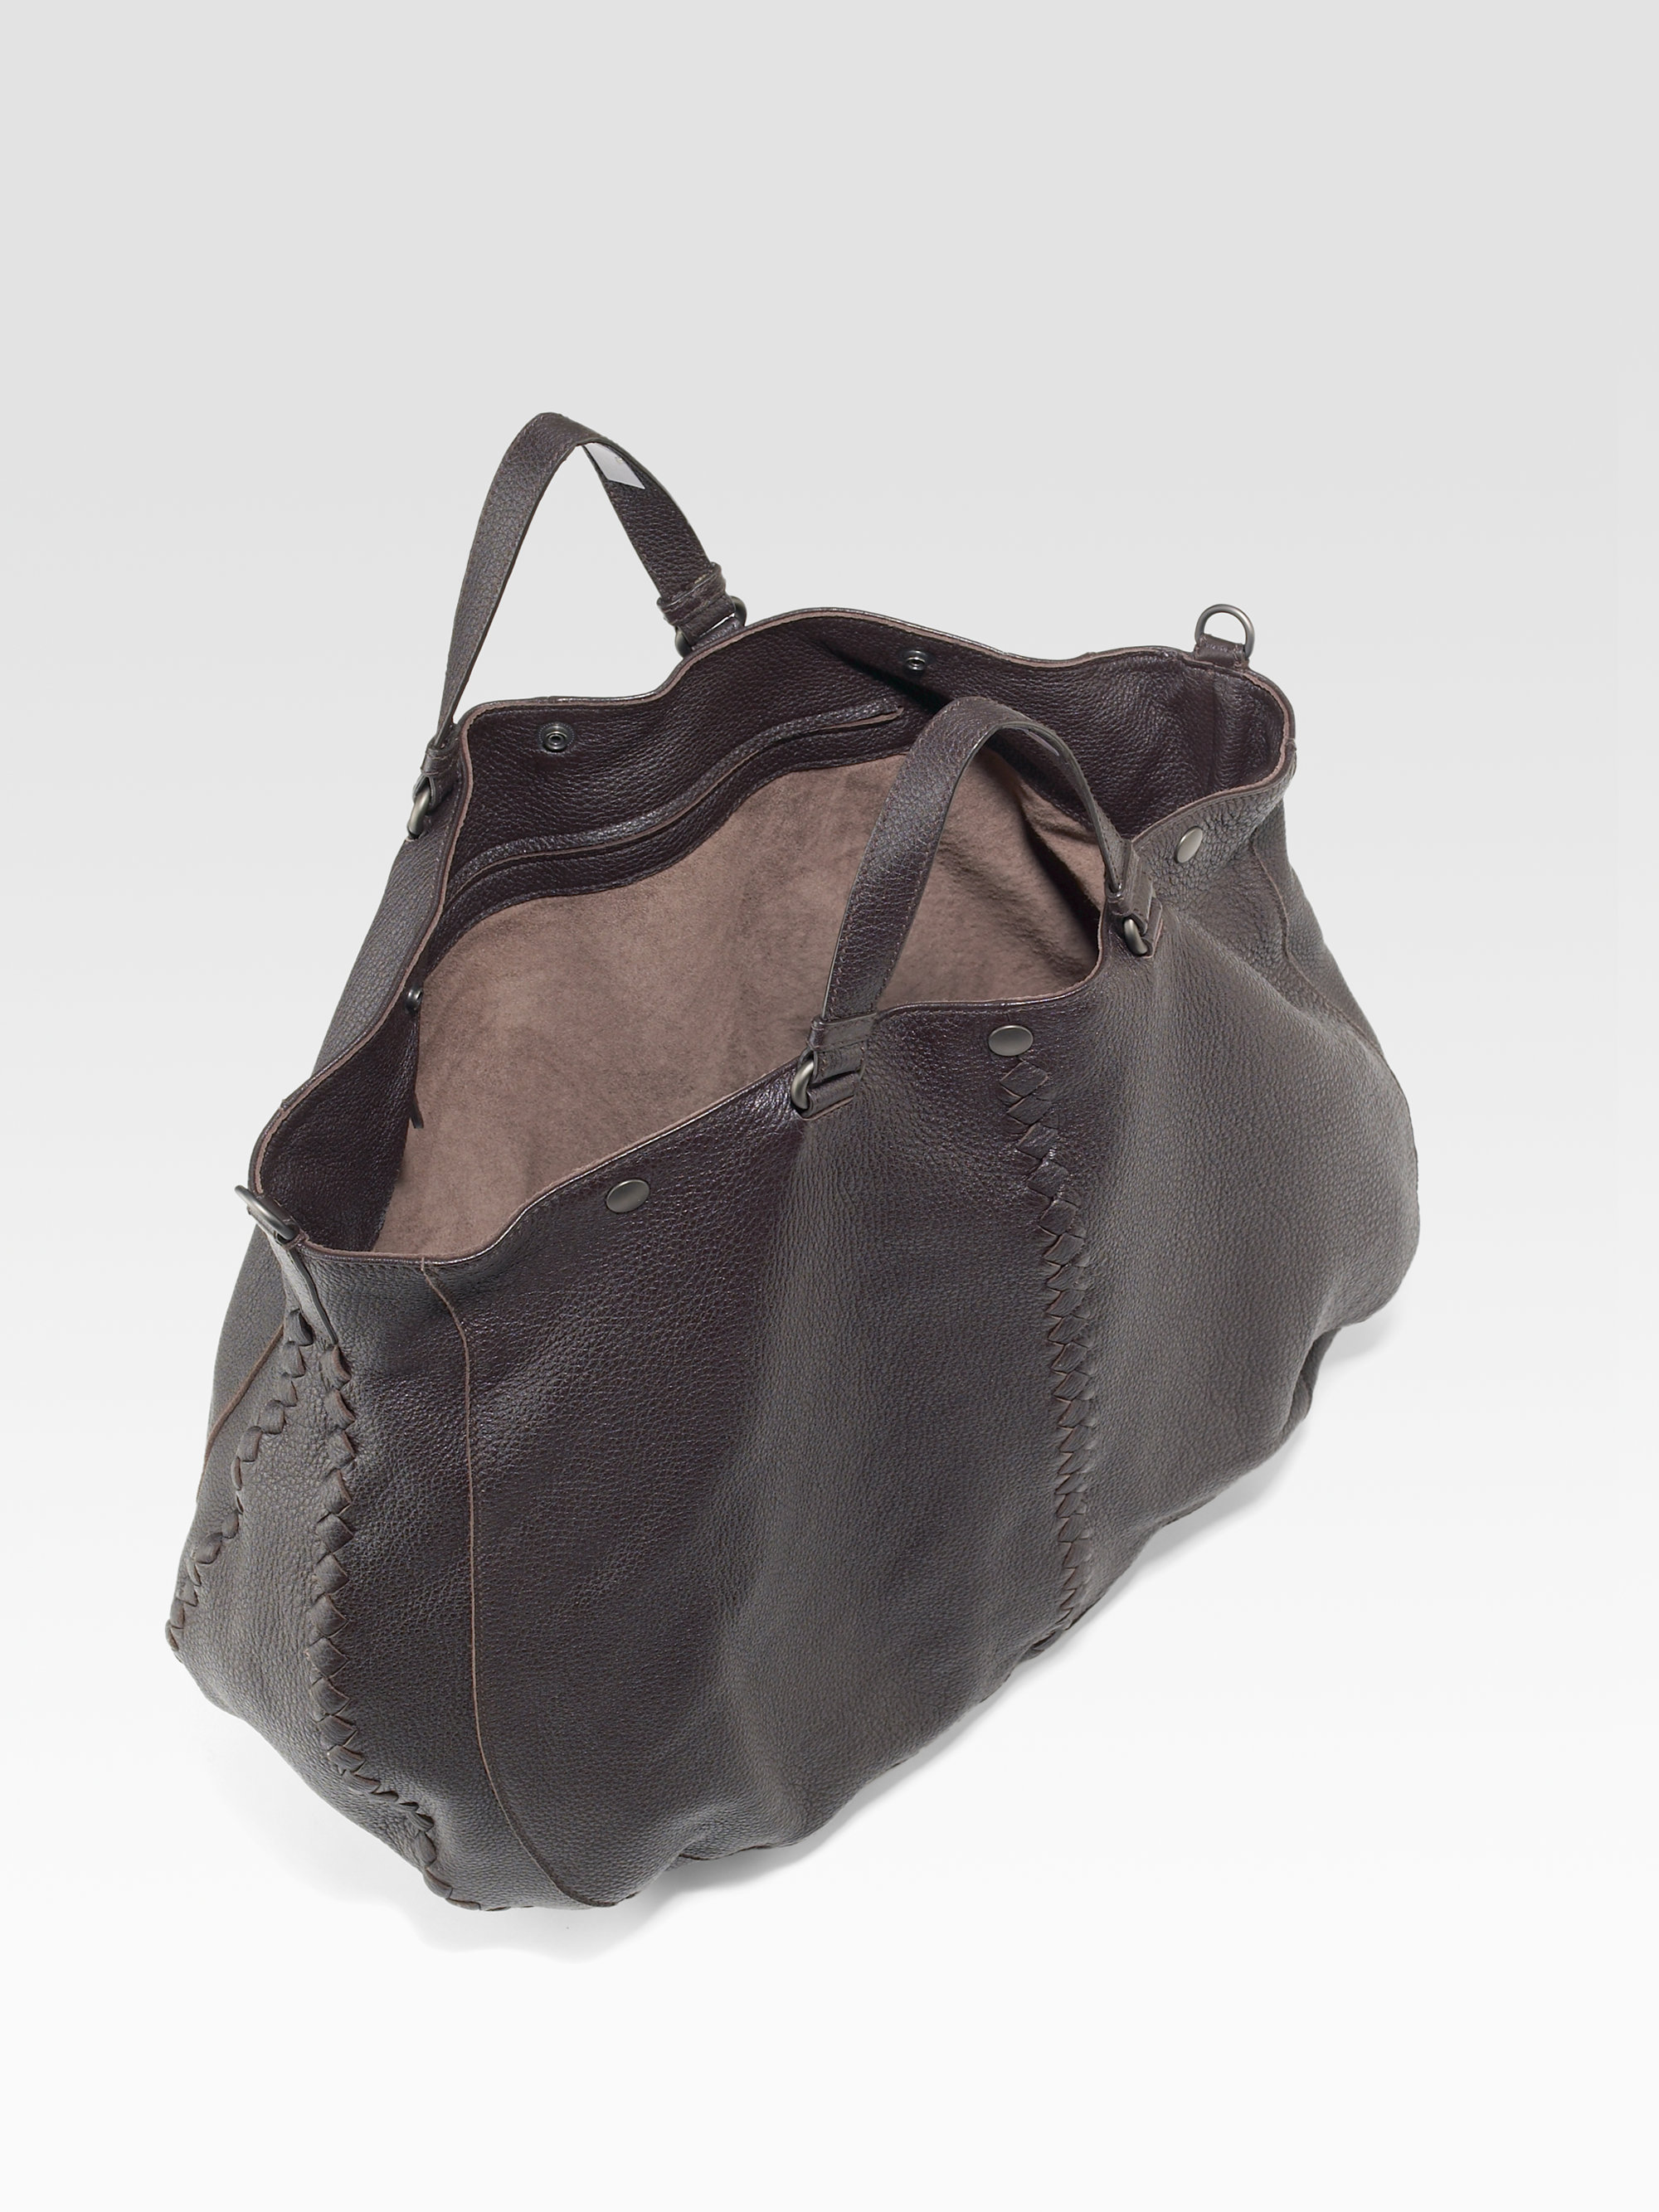 de638116943 Lyst - Bottega Veneta Cervo Large Leather Tote Bag in Black